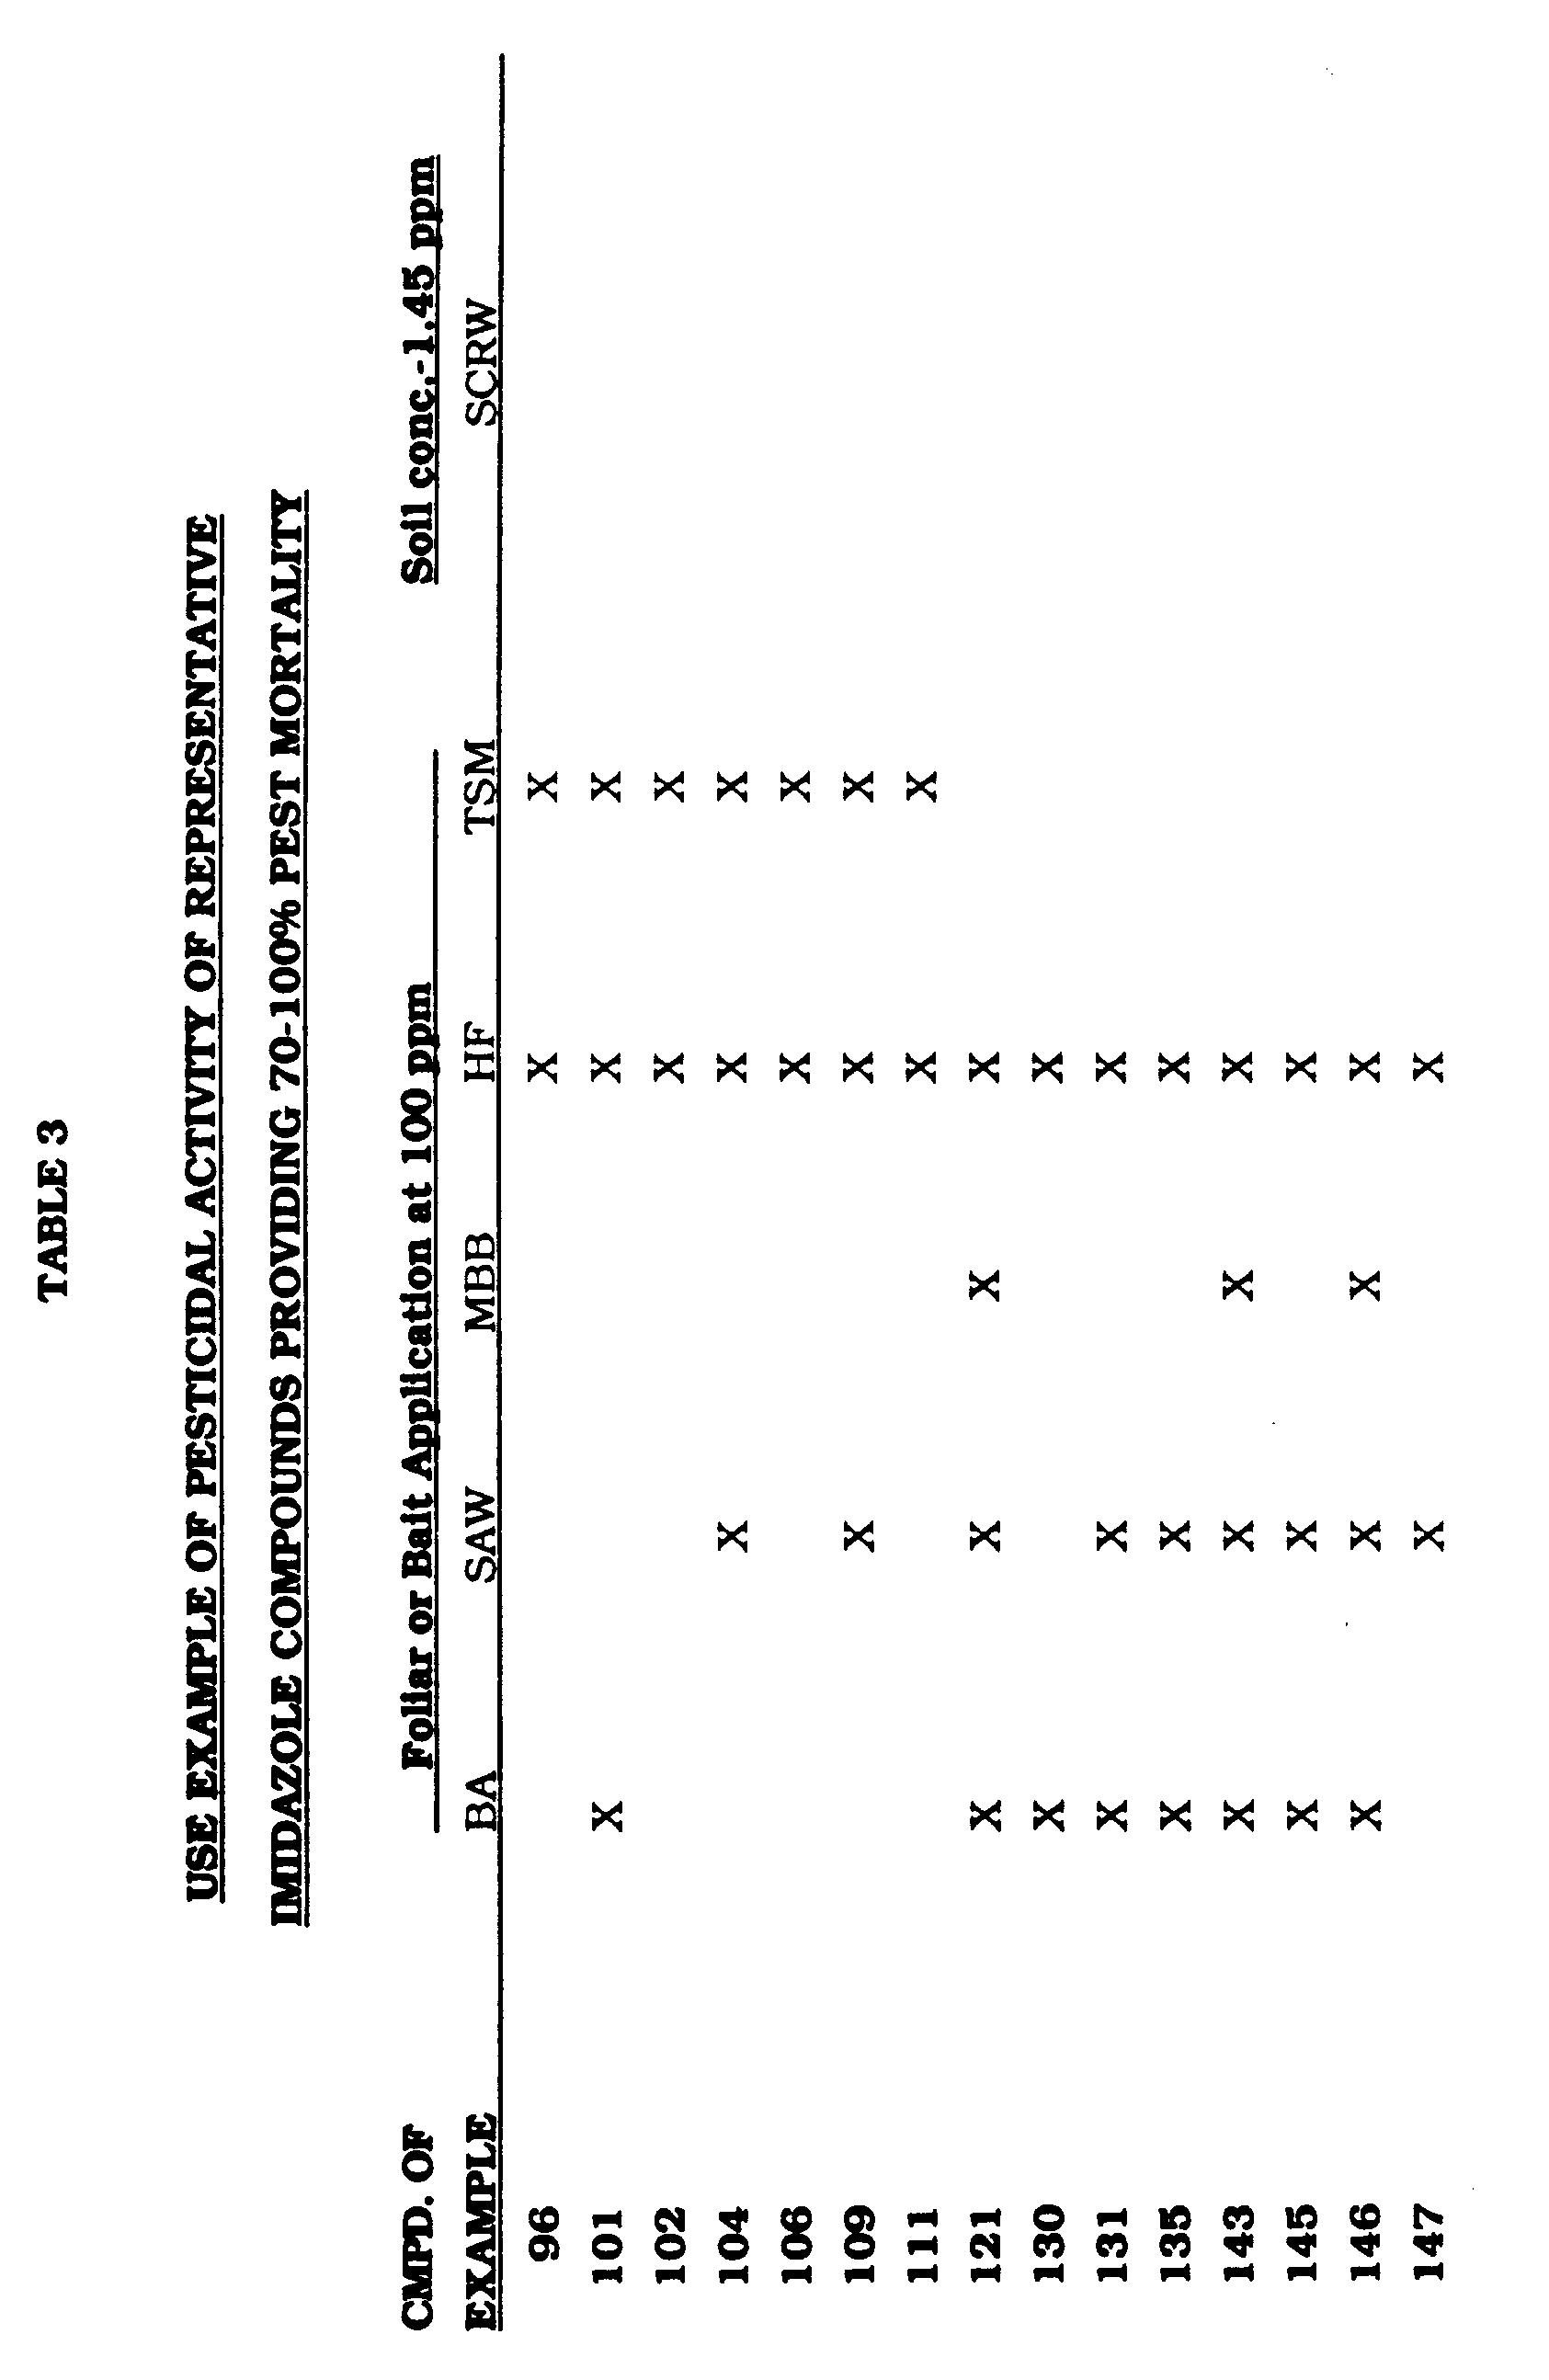 hight resolution of ep0396427b1 pesticidal 1 arylimidazoles google patents rh google com